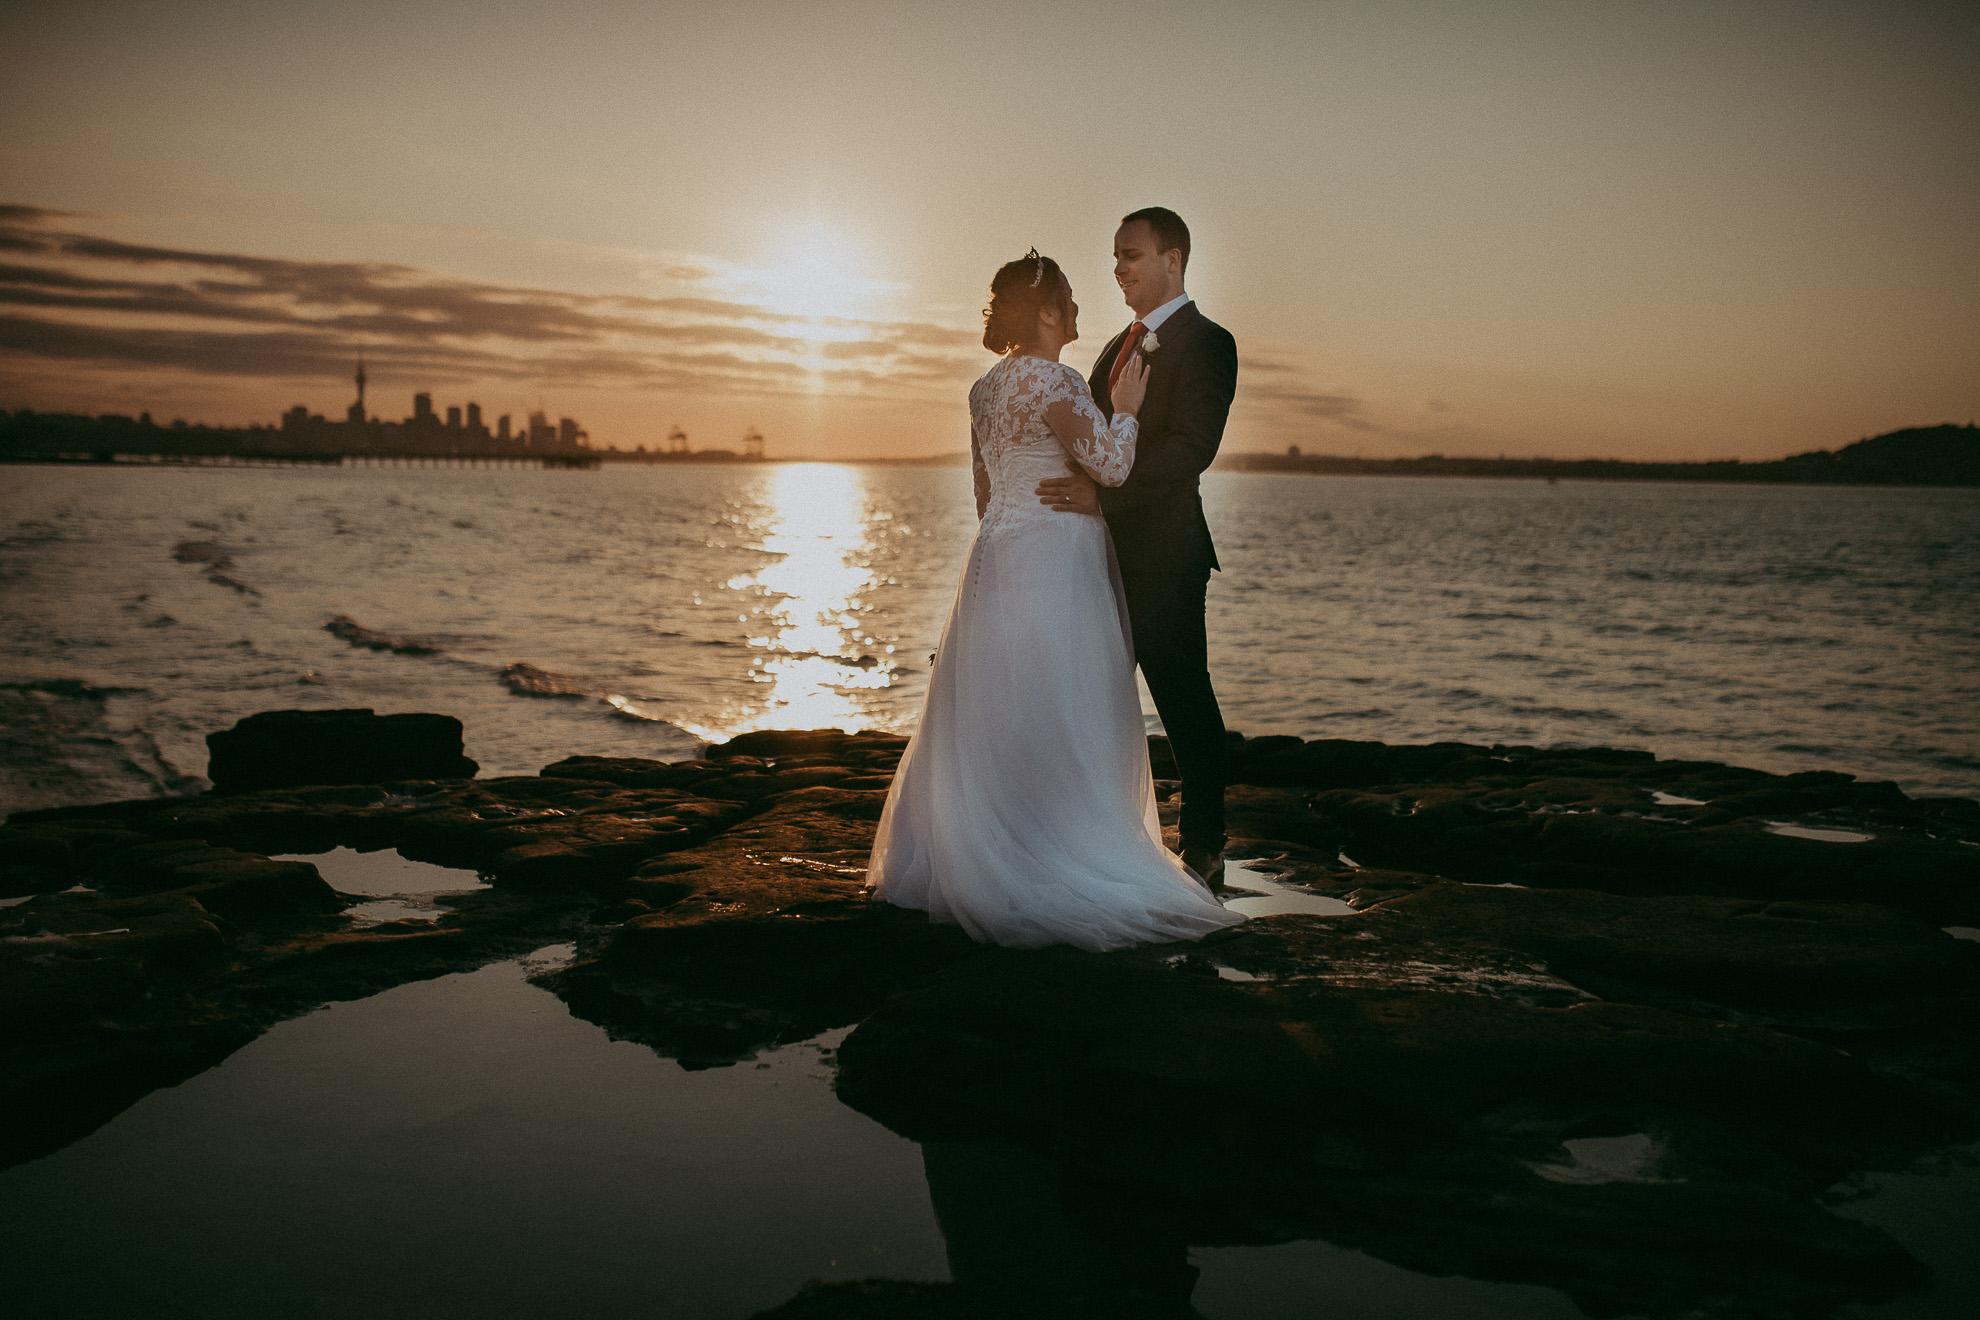 wedding-by-levien-613.jpg